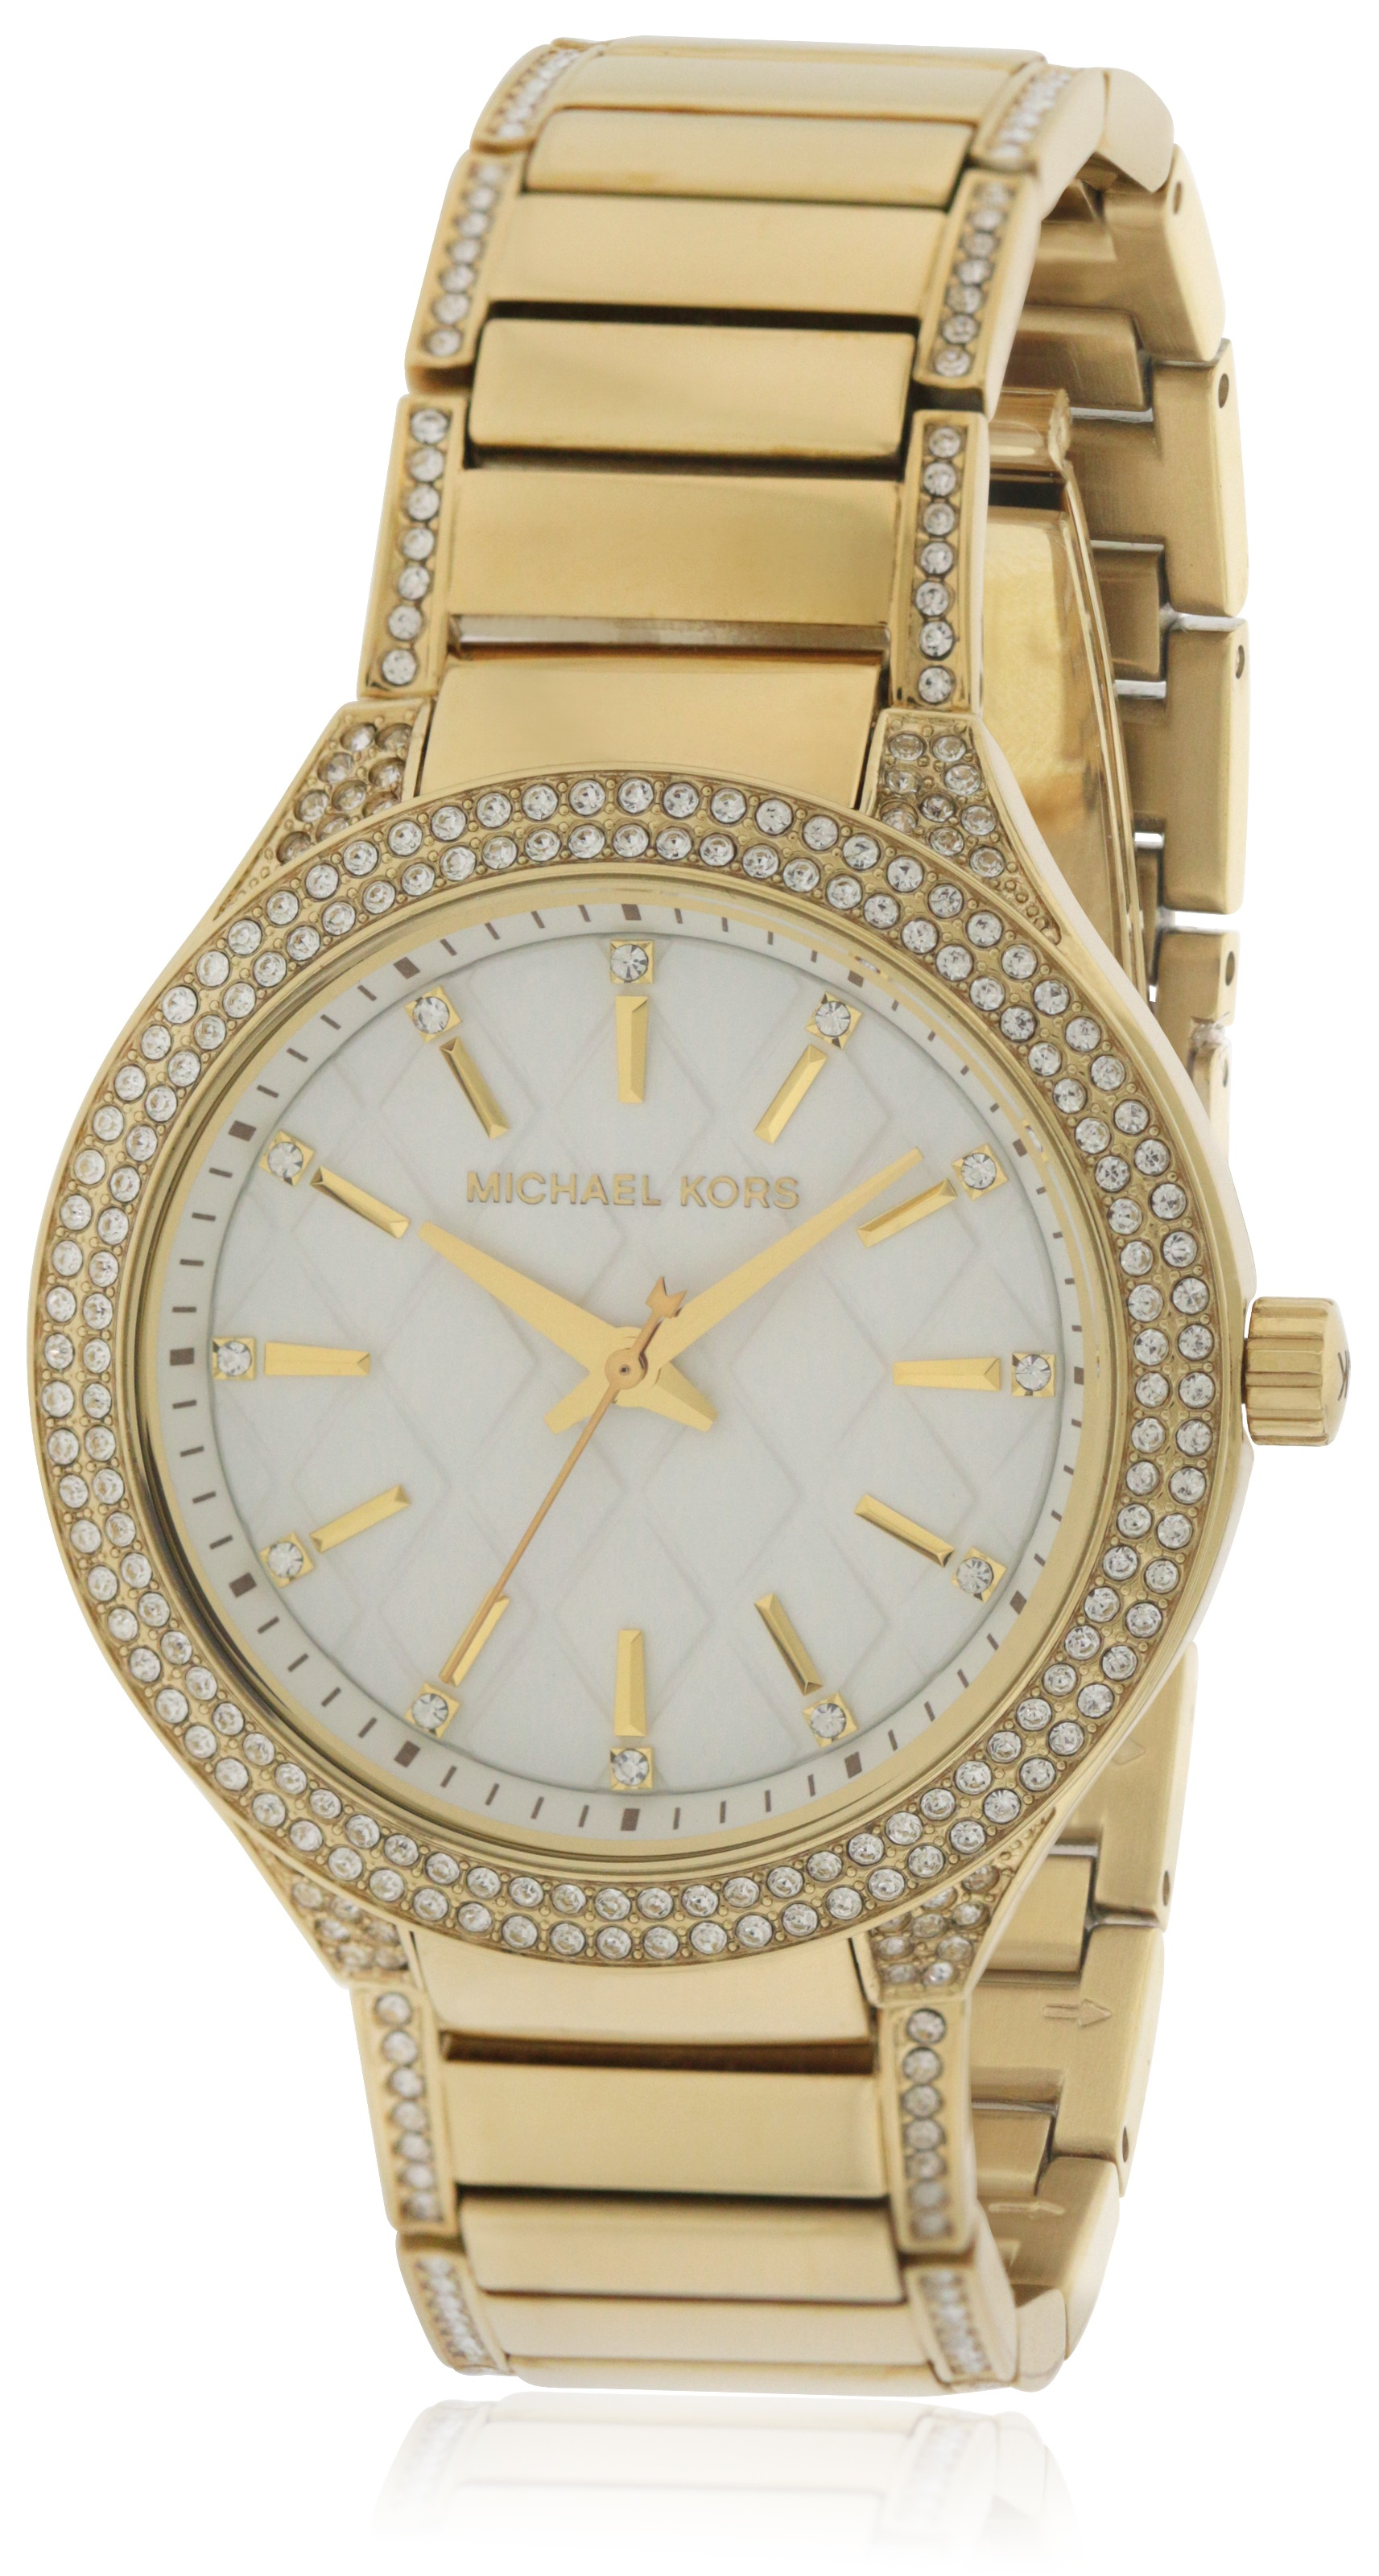 74ccda66ed0e Michael Kors Kerry Gold-Tone Ladies Watch MK3347